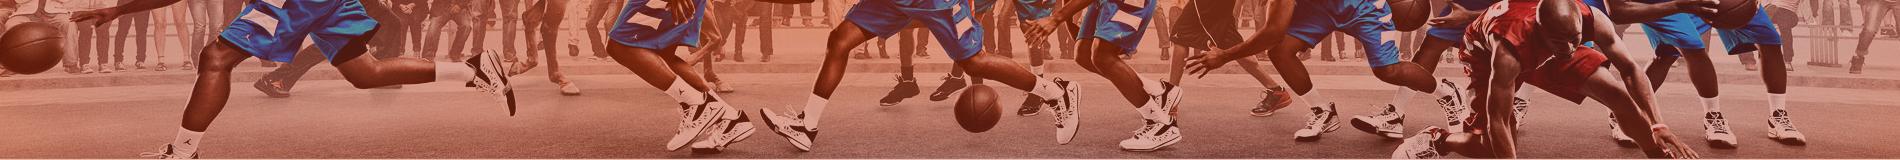 Sport Injury Insurance